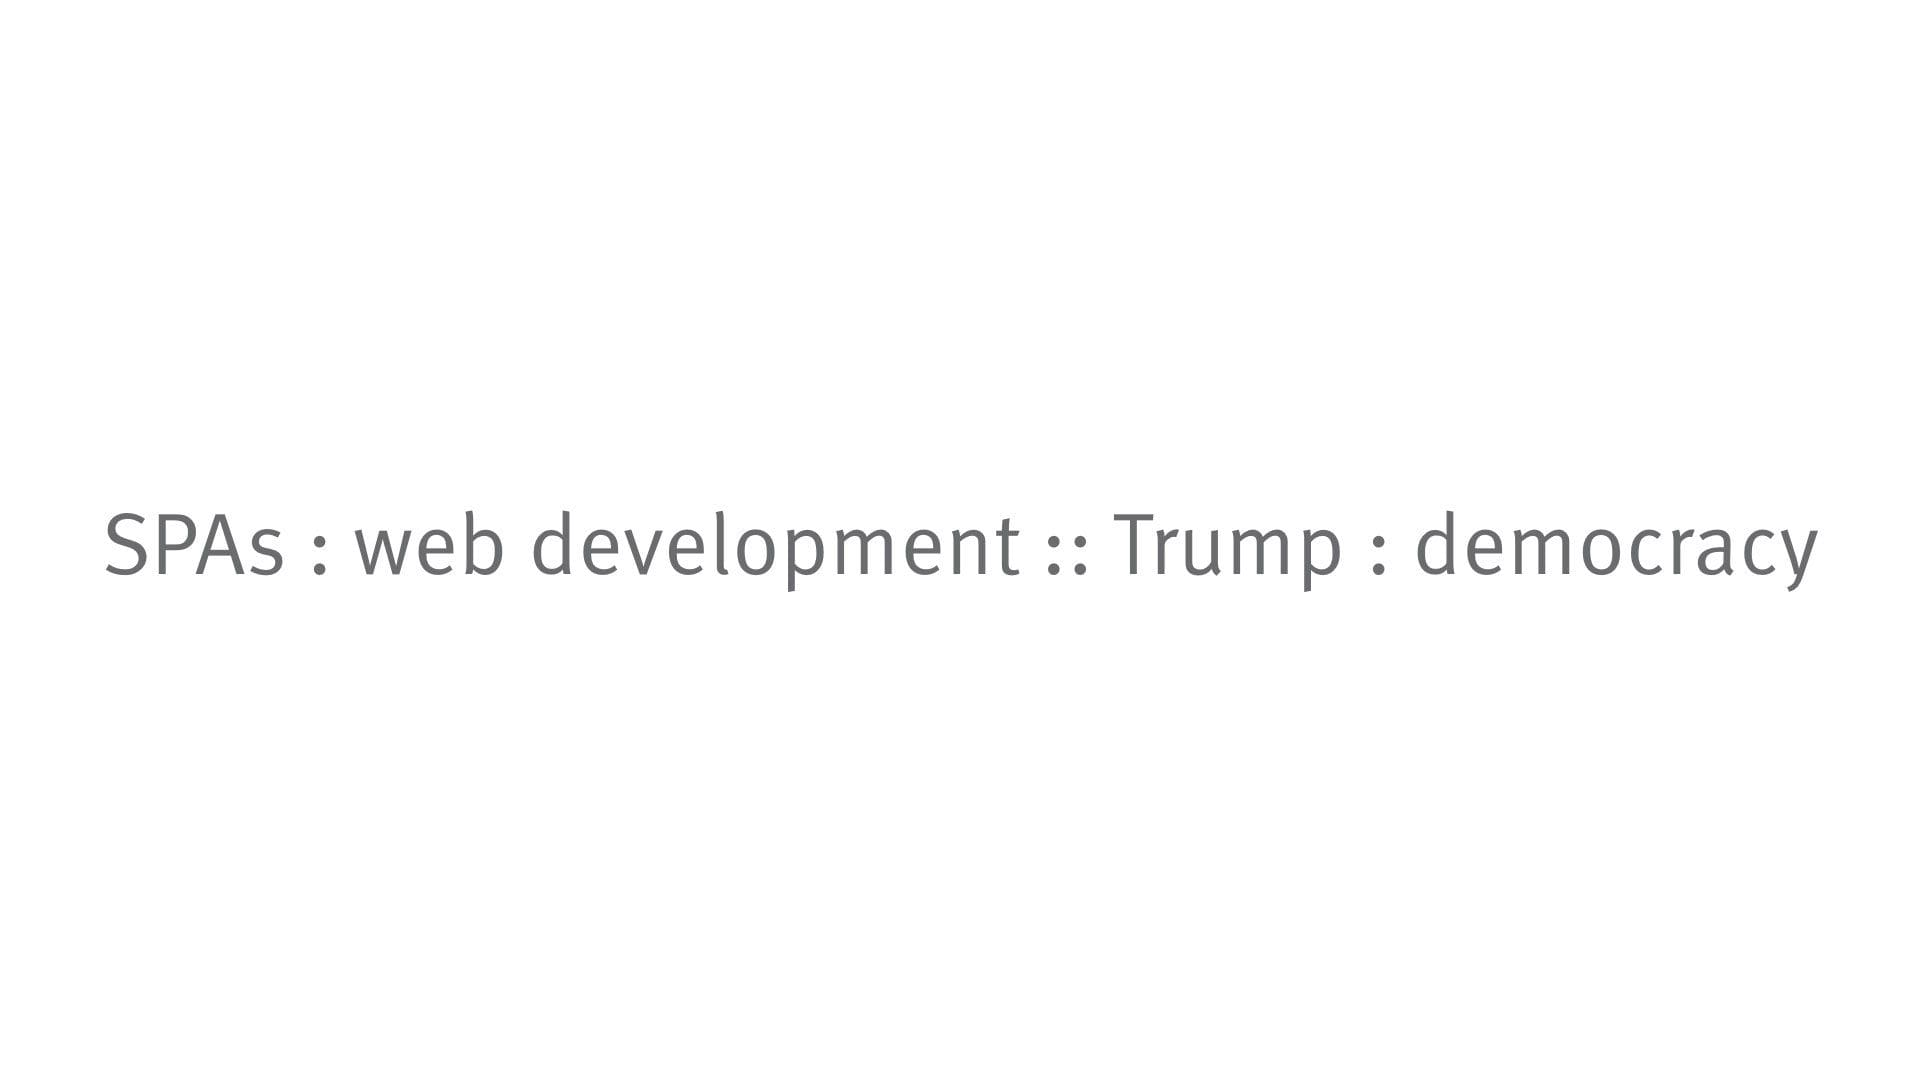 SPAs : web development :: Trump : democracy